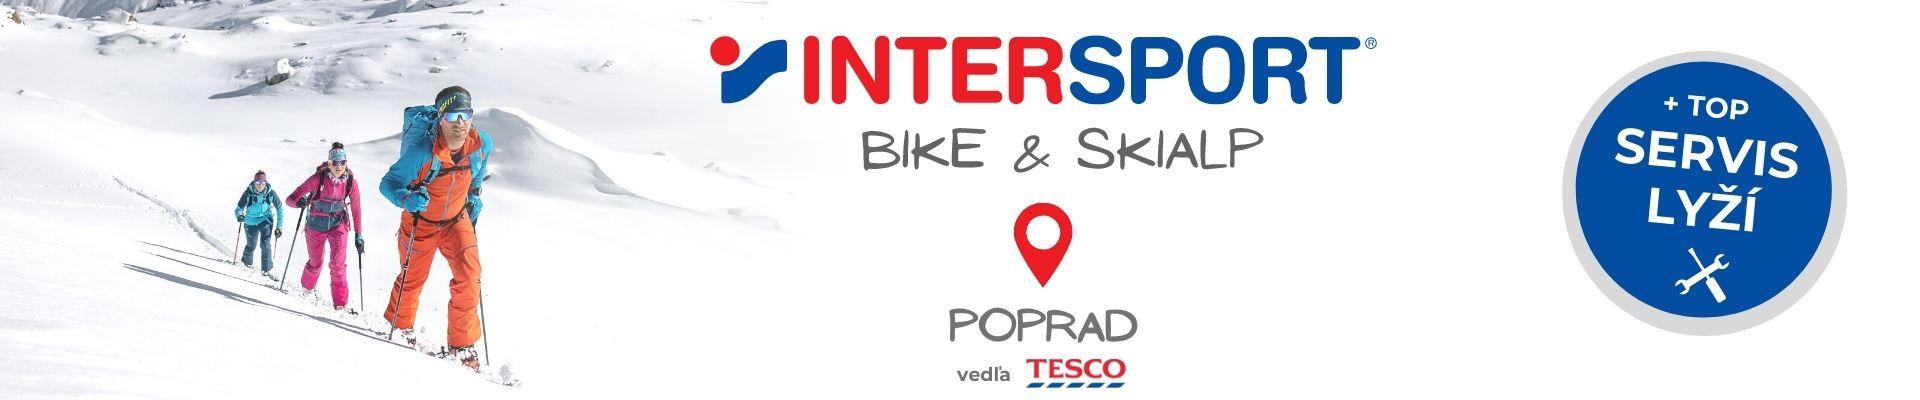 bike & skialp